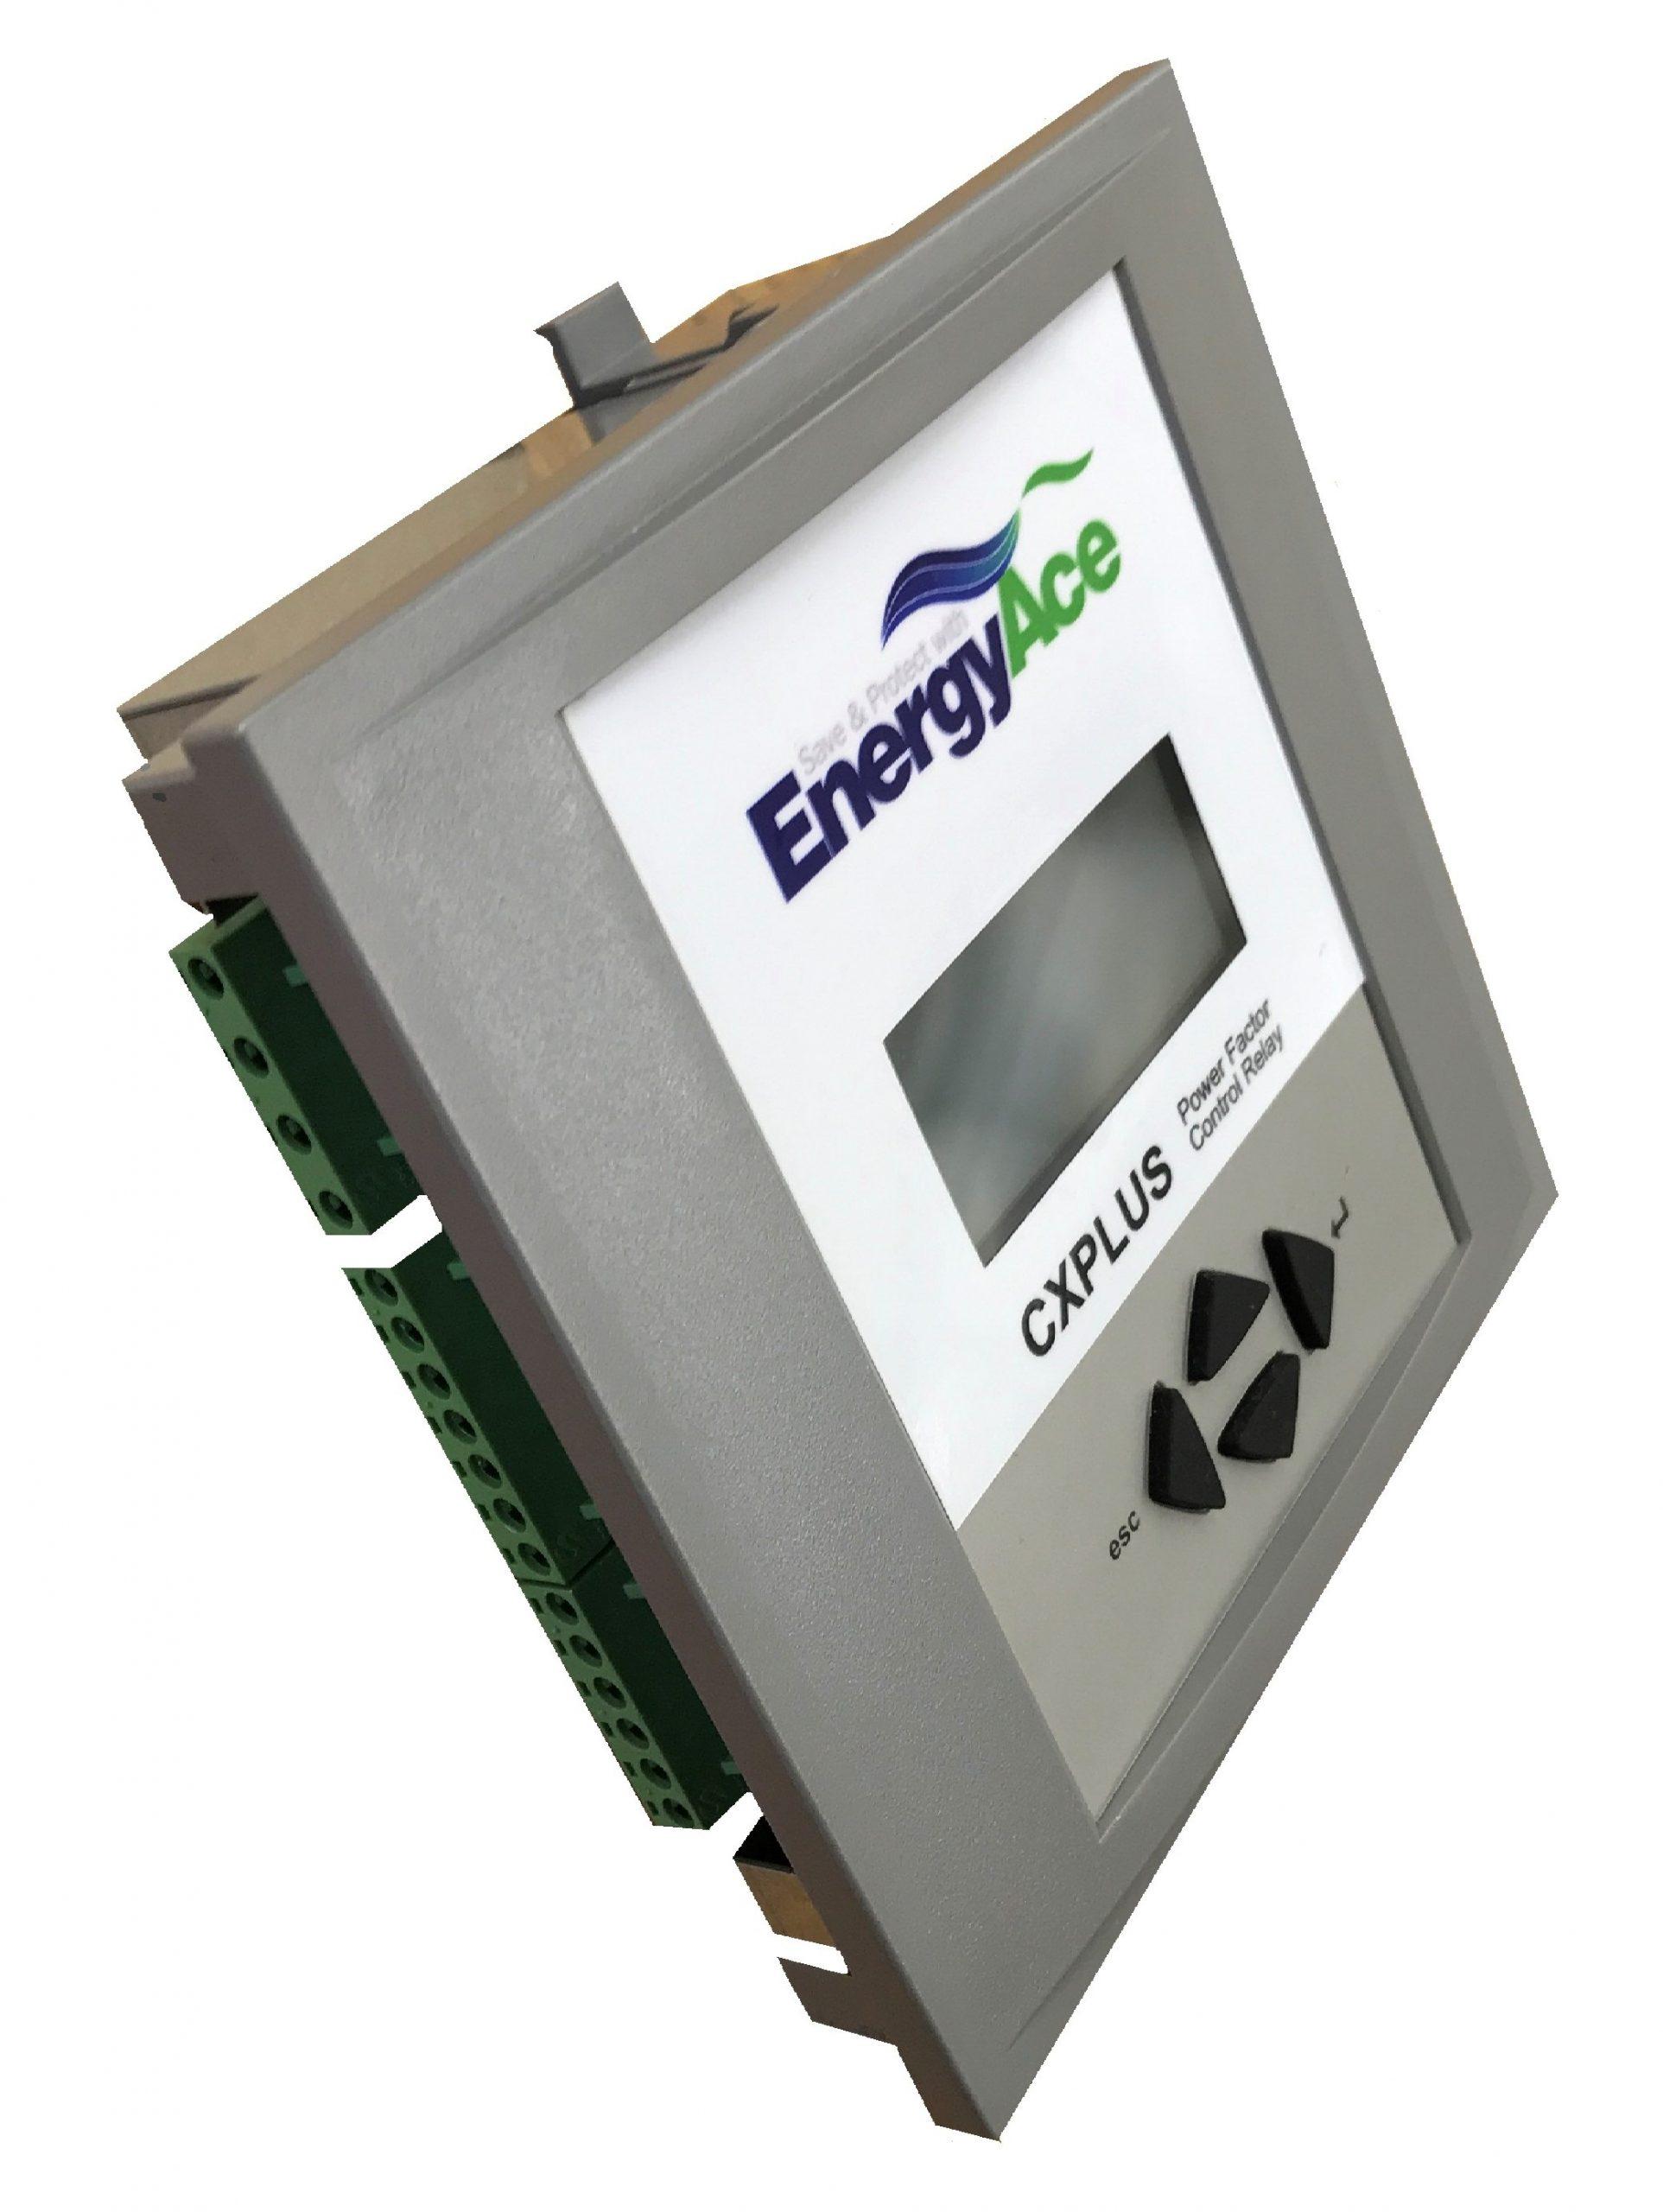 to promote a power factor correction control relay